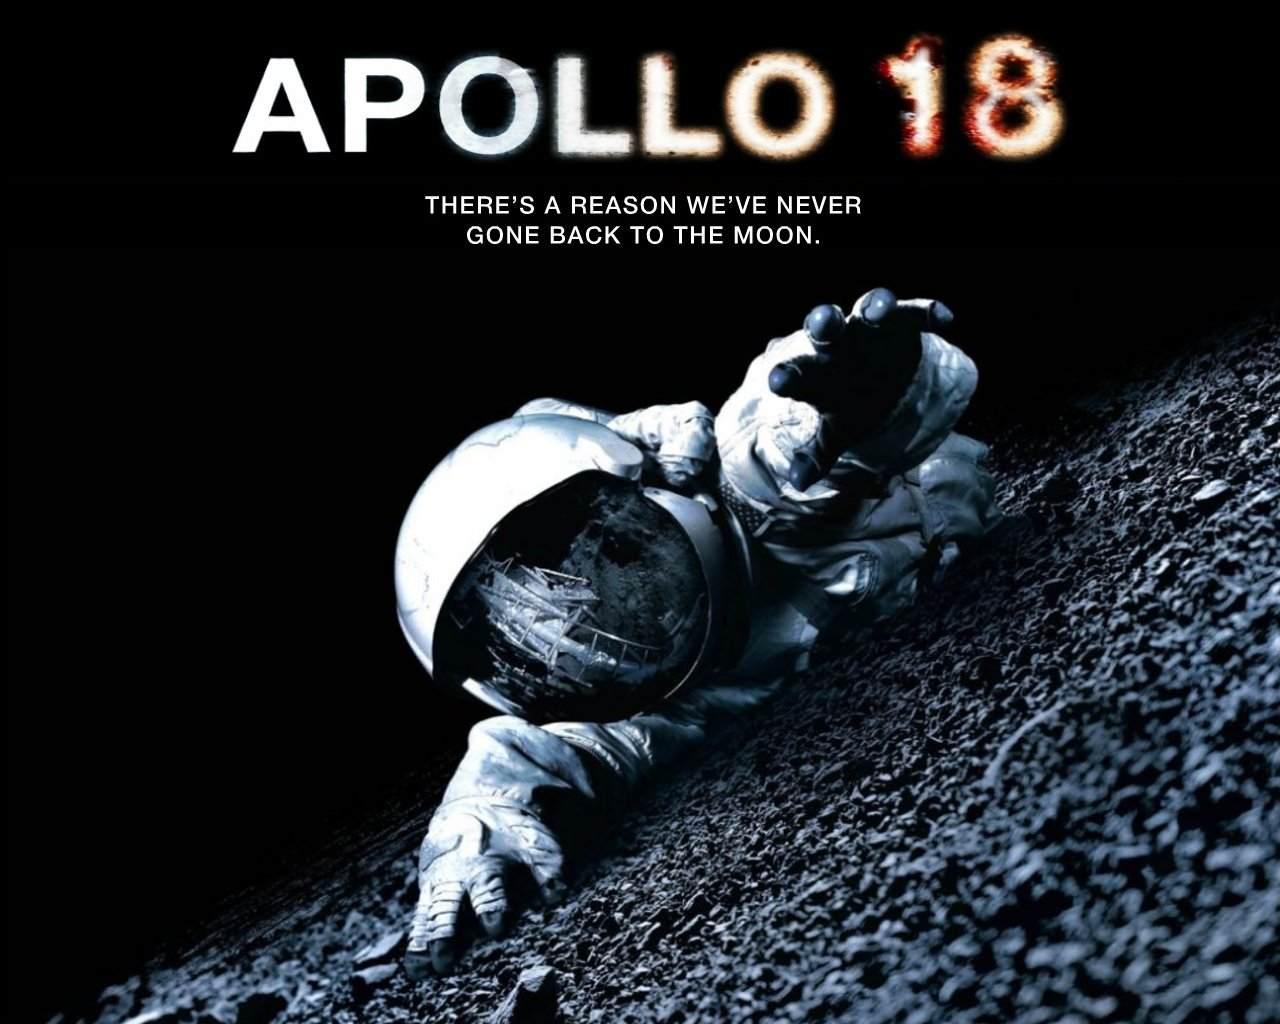 apollo space program documentary - photo #46